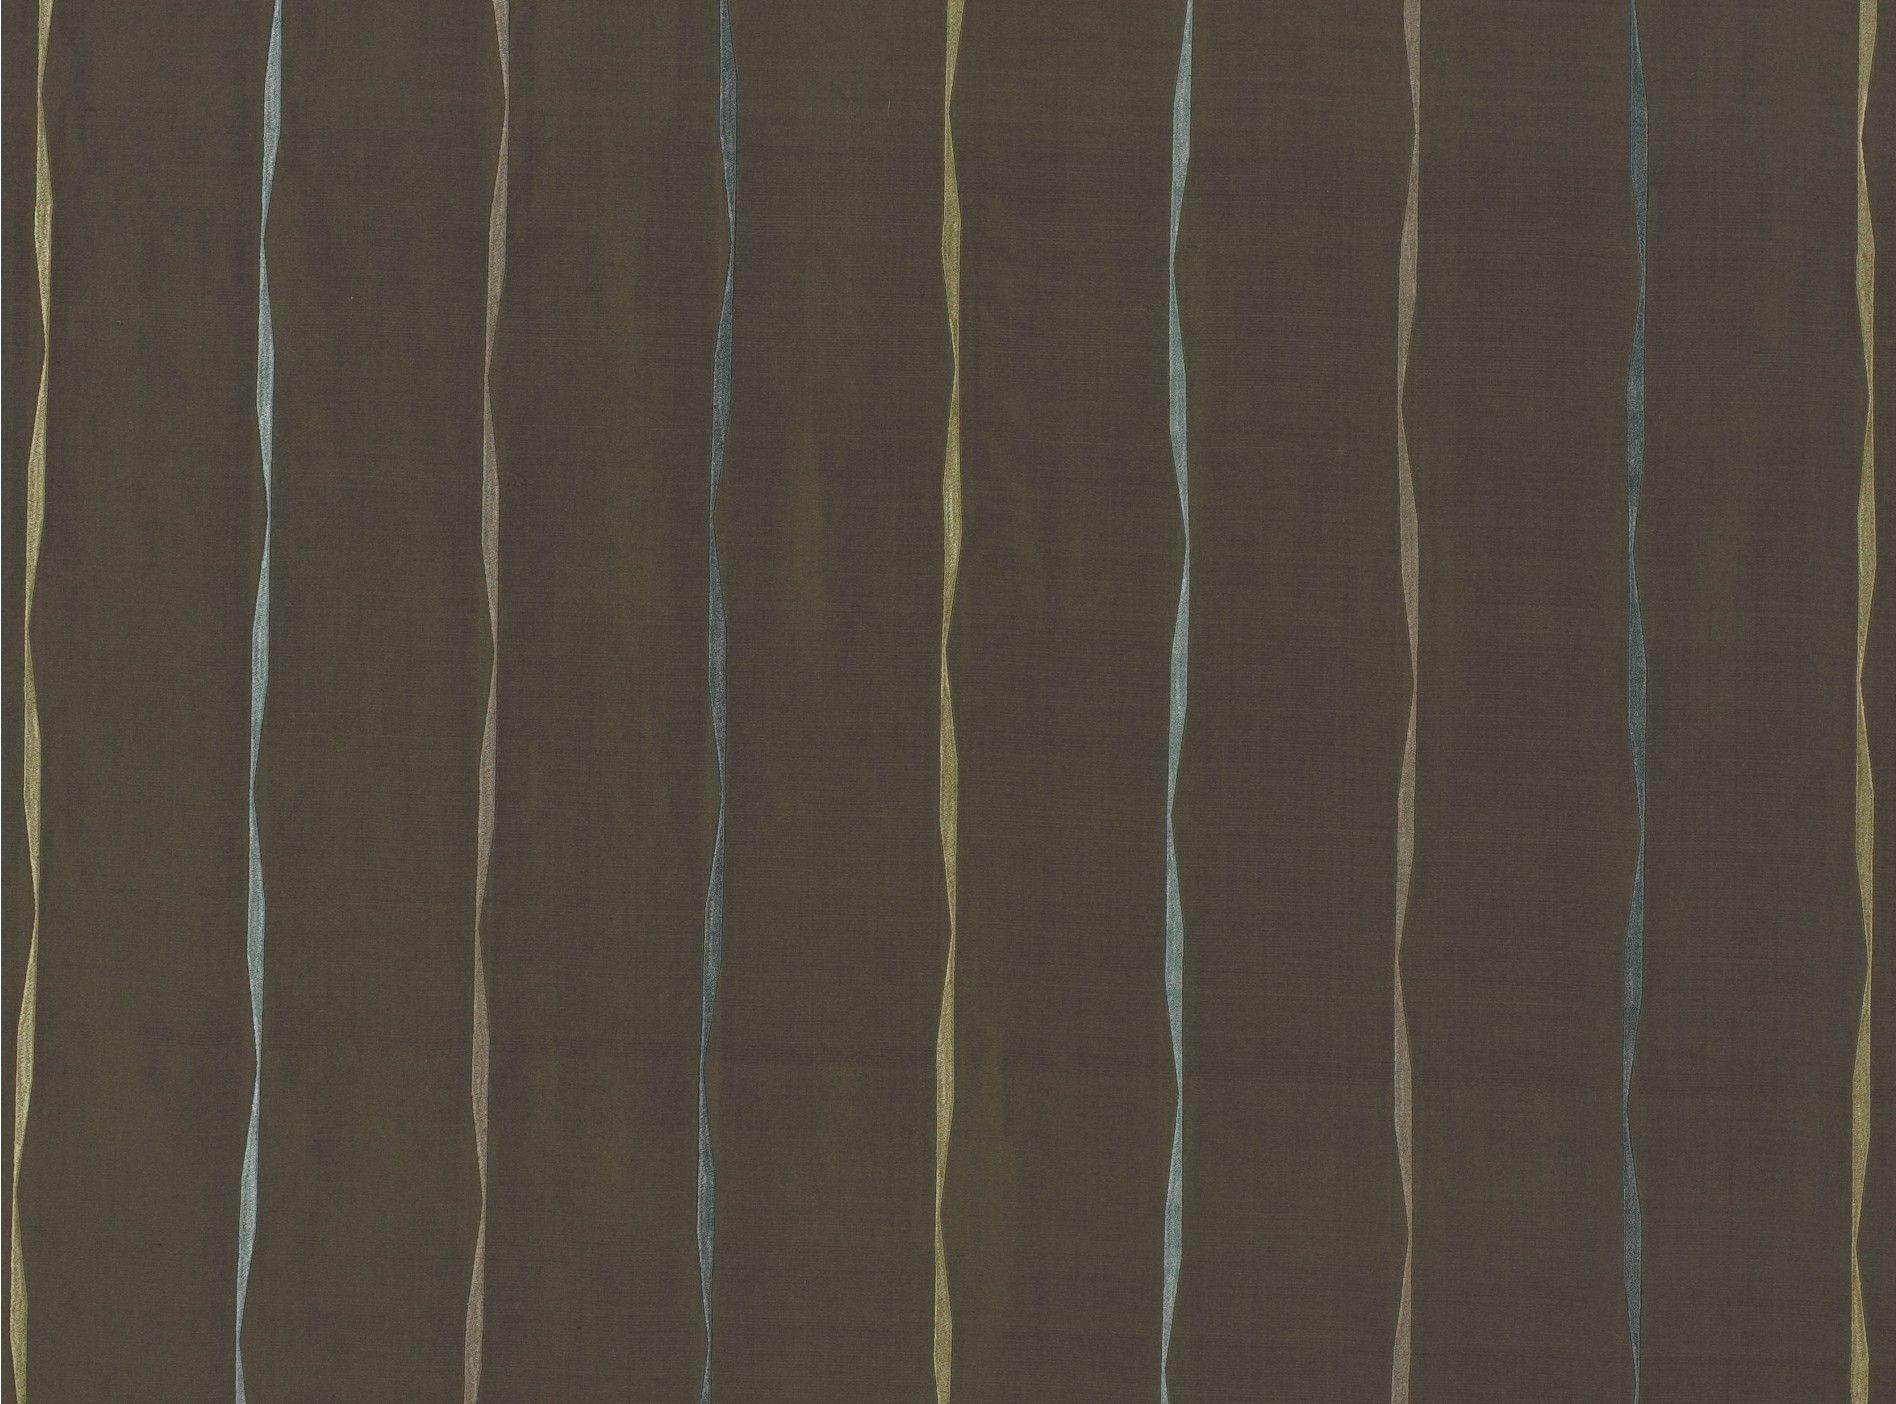 Maypole Fossil /Spearmint fabric by Villa Romo